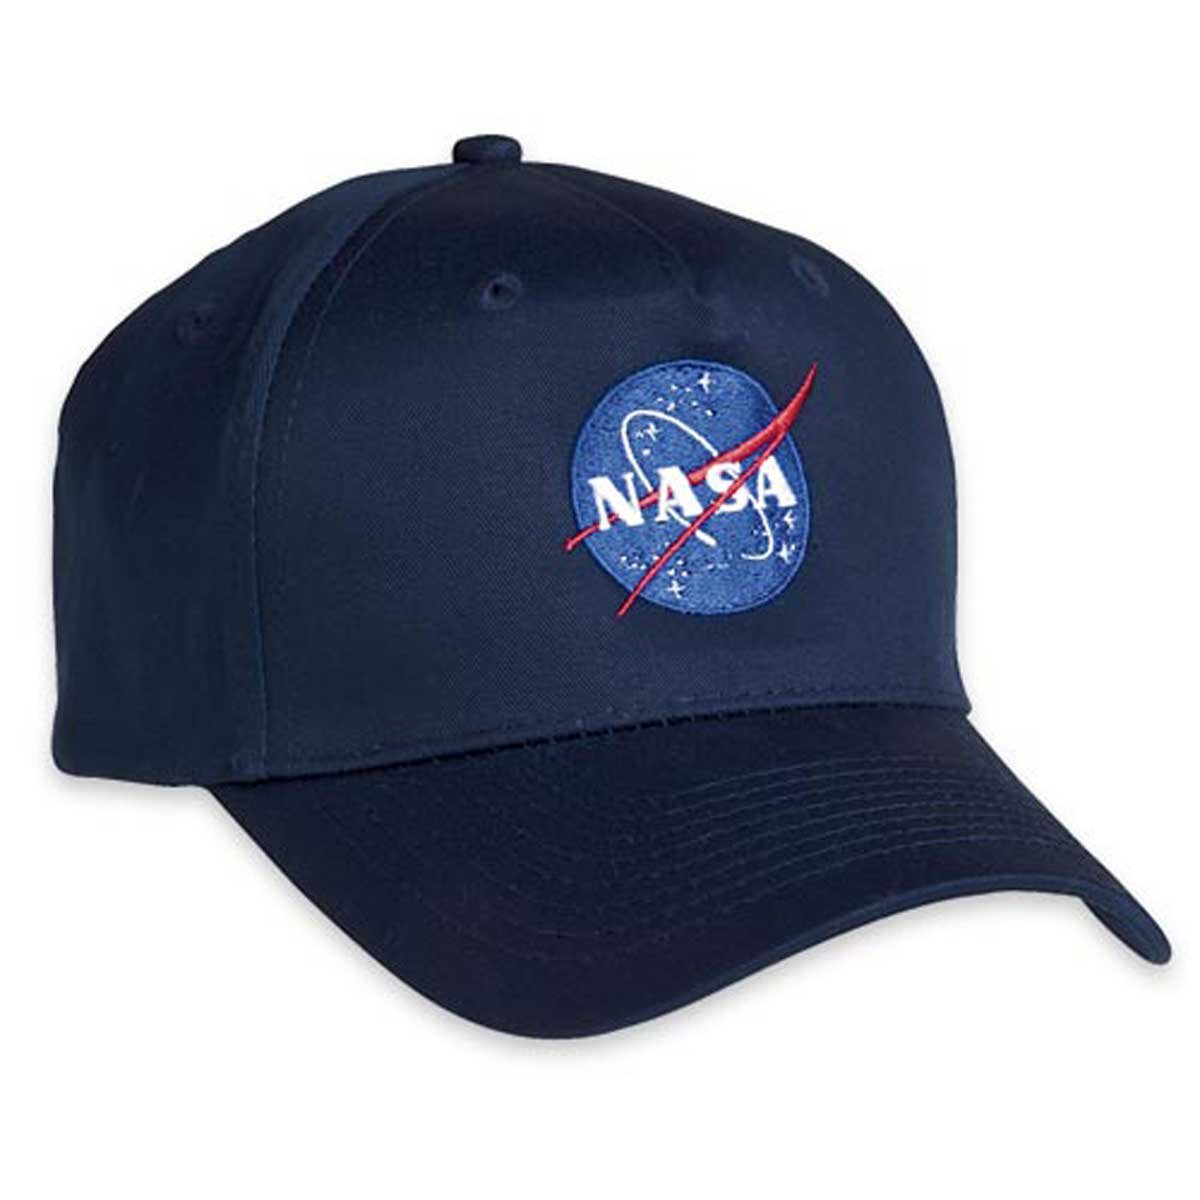 71842a3bab0 Amazon.com  ComputerGear NASA Baseball Cap Men Women Space Embroidered  Officially Licensed Cotton Black  Clothing